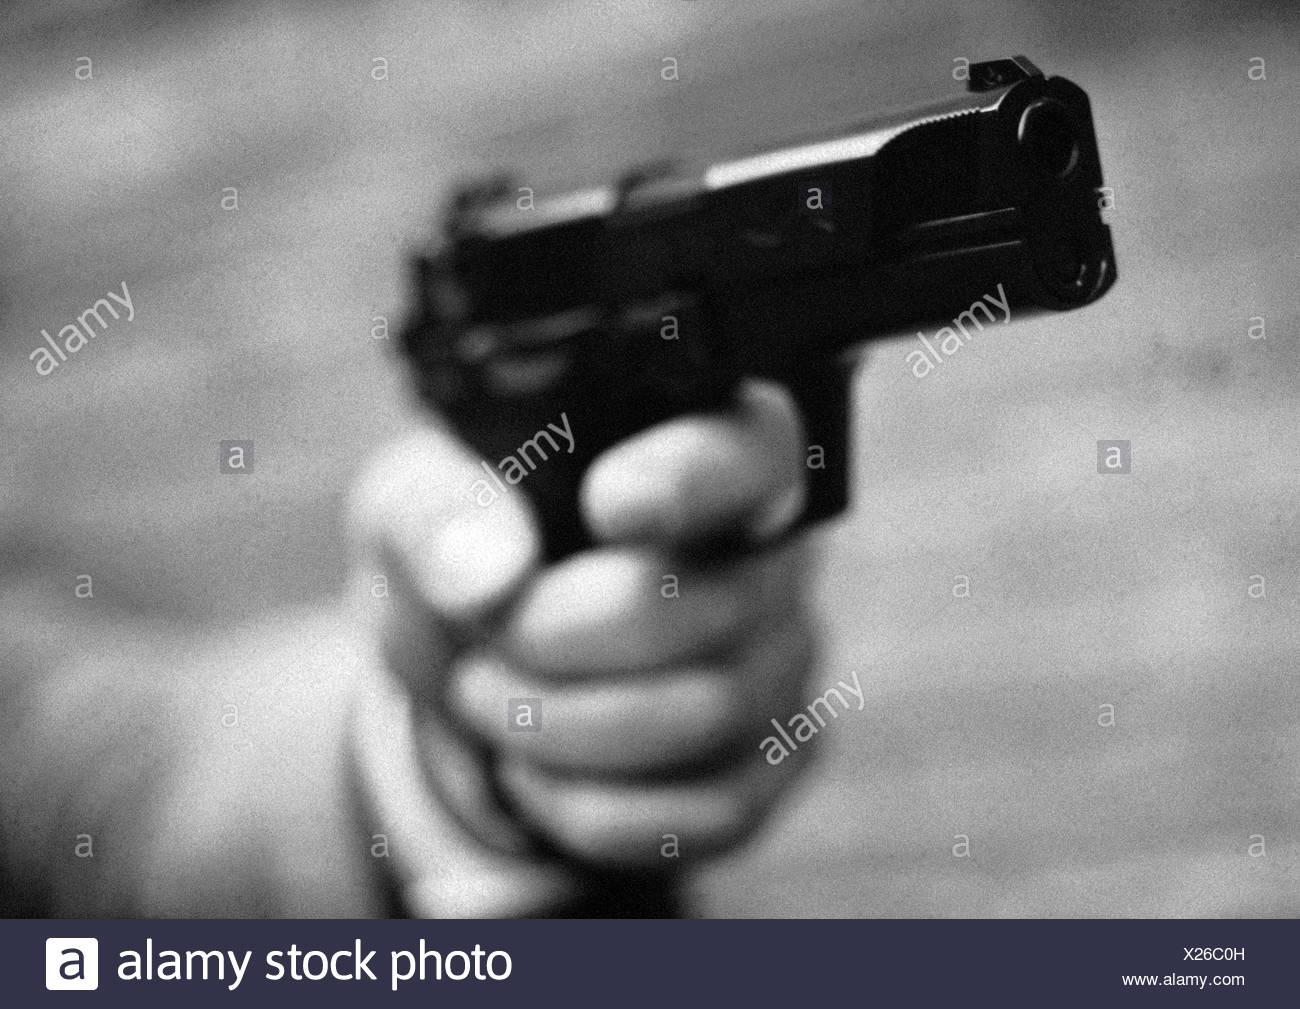 Hand holding gun, close-up, b&w - Stock Image